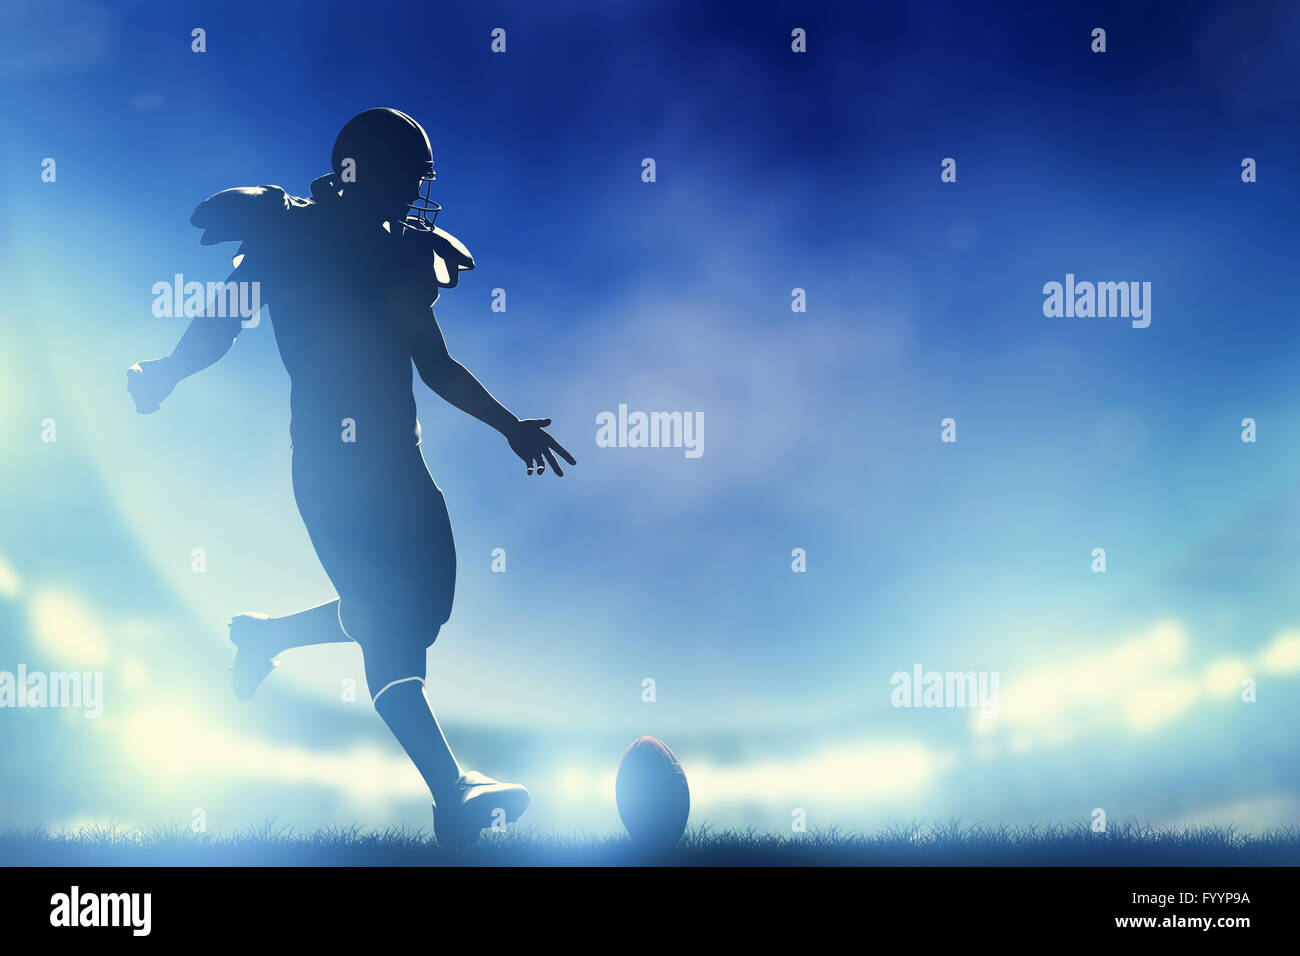 American football player kicking the ball - Stock Image